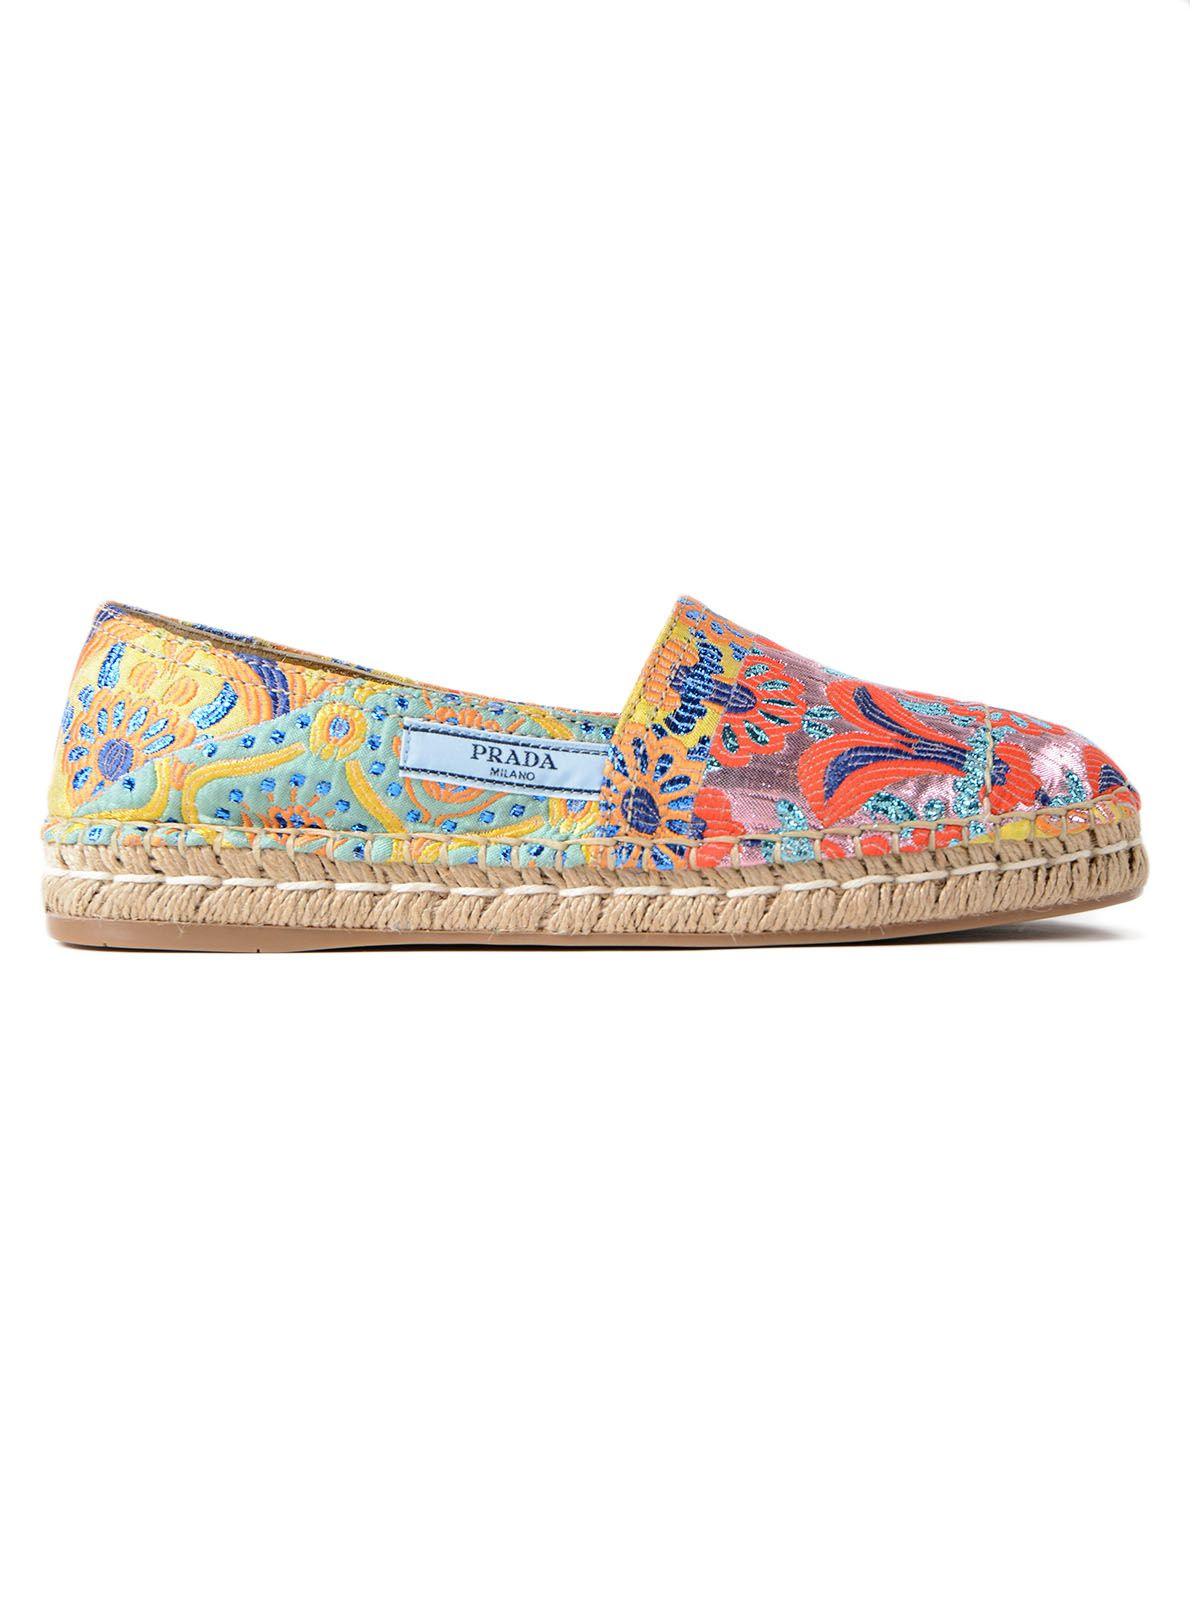 Prada Lurex Patch Slippers